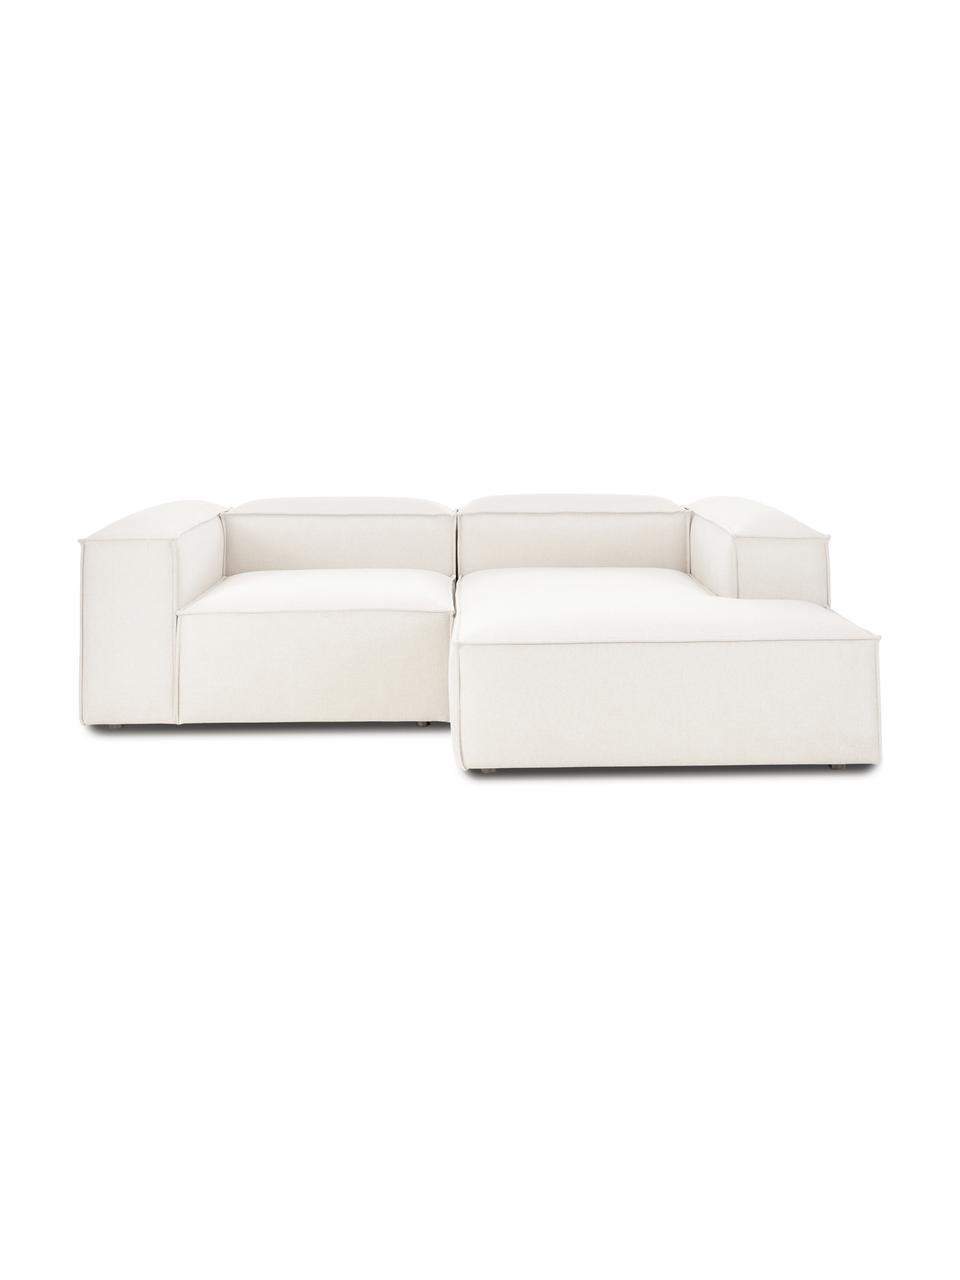 Canapé d'angle modulable beige Lennon, Tissu beige